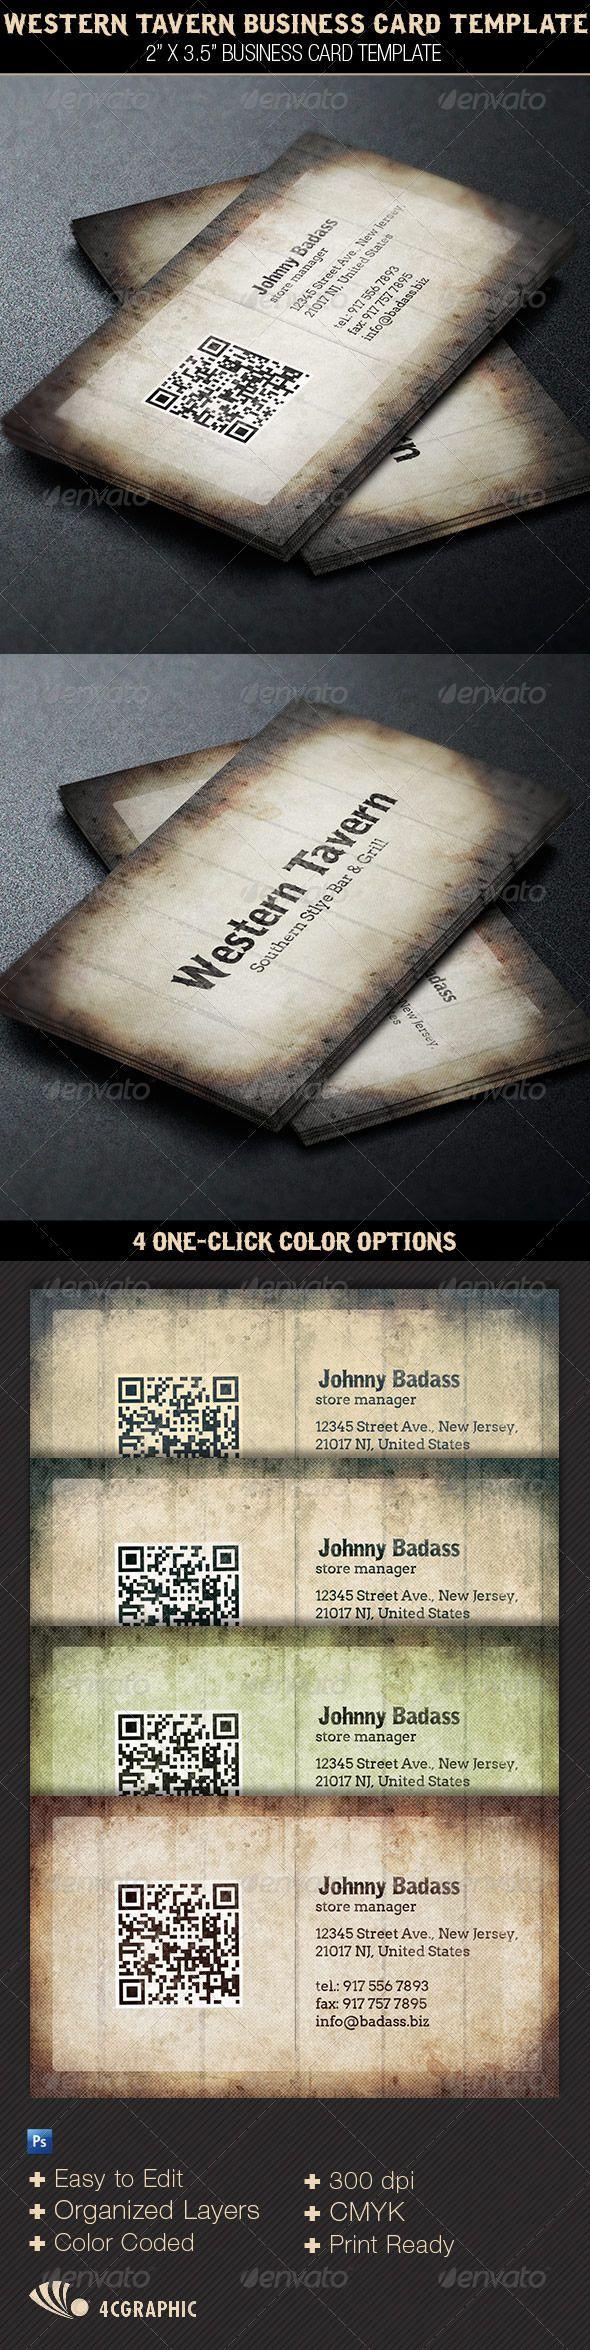 2867 best Business Card Template & Design images on Pinterest ...